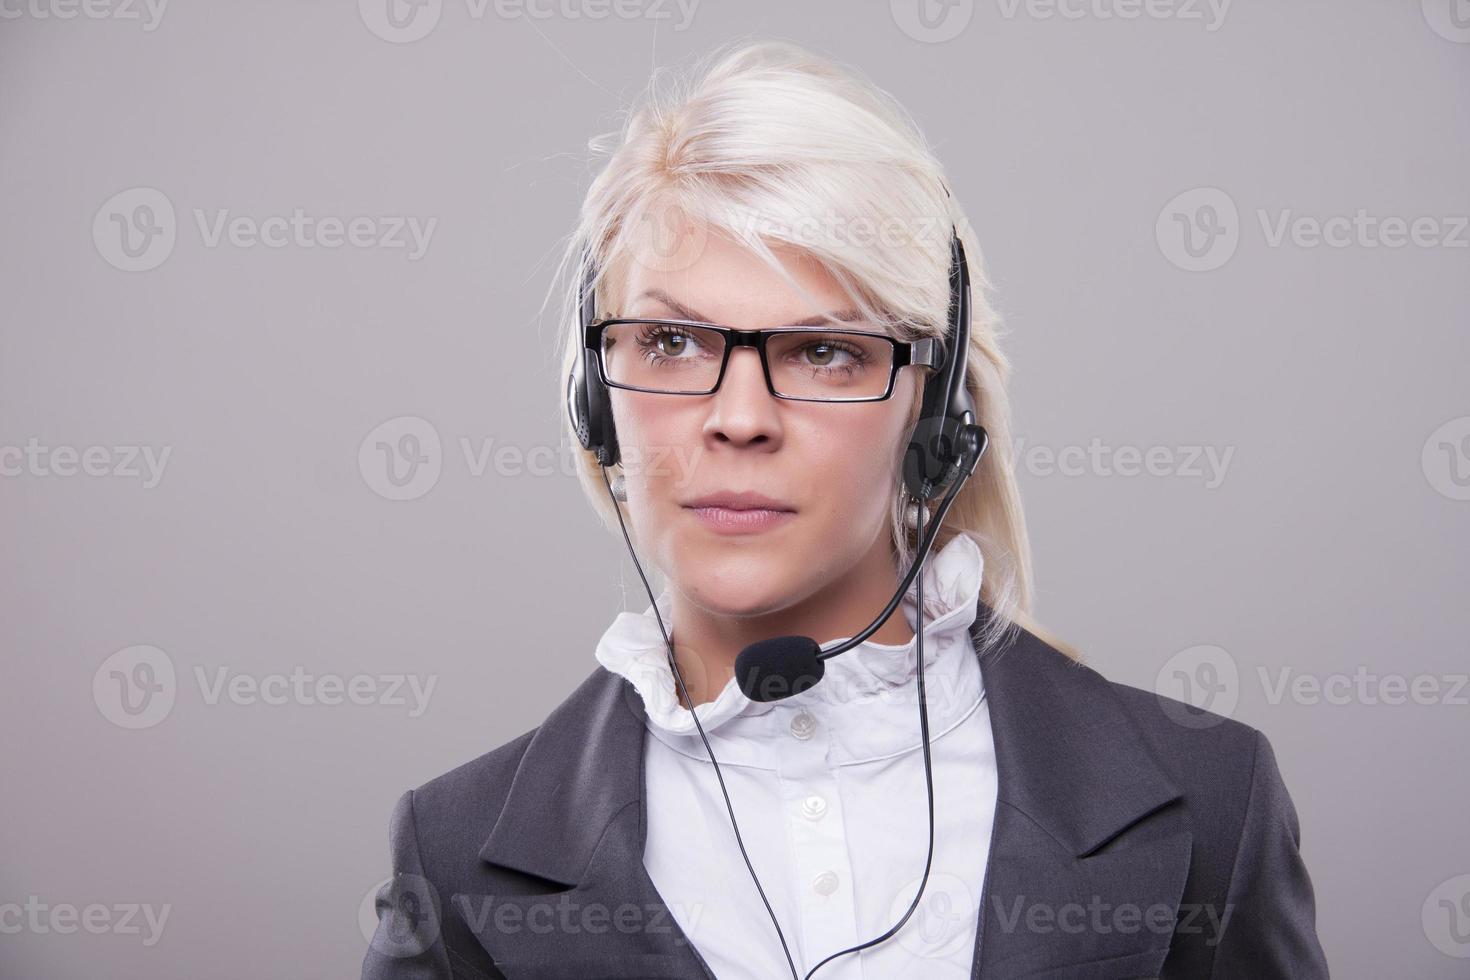 Headset photo